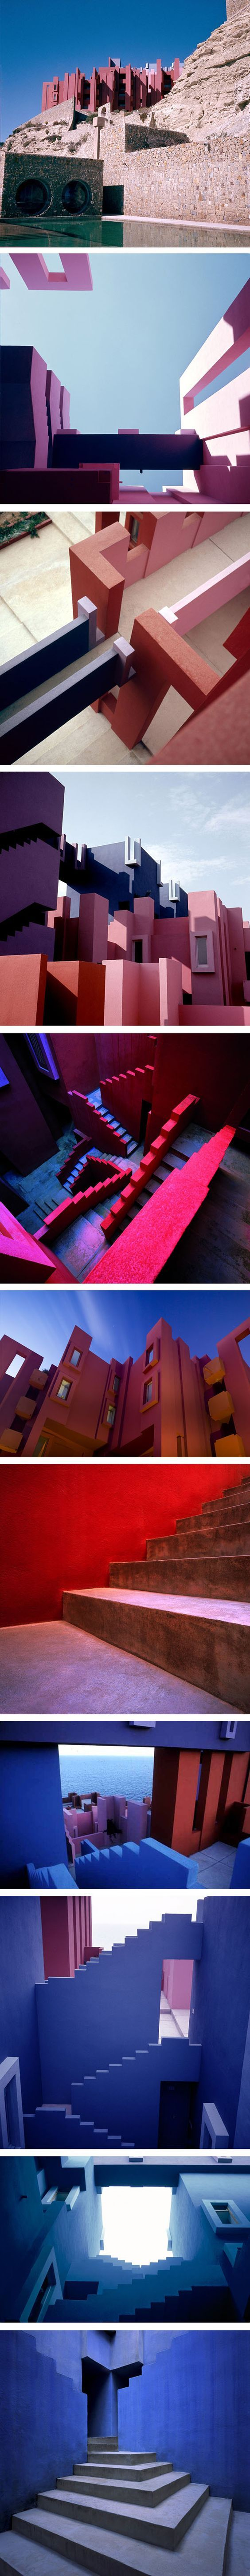 La Muralla Roja (Red Wall). Housing Project in Calpe, Spain. Spanish architect Richardo Bofil.1968: